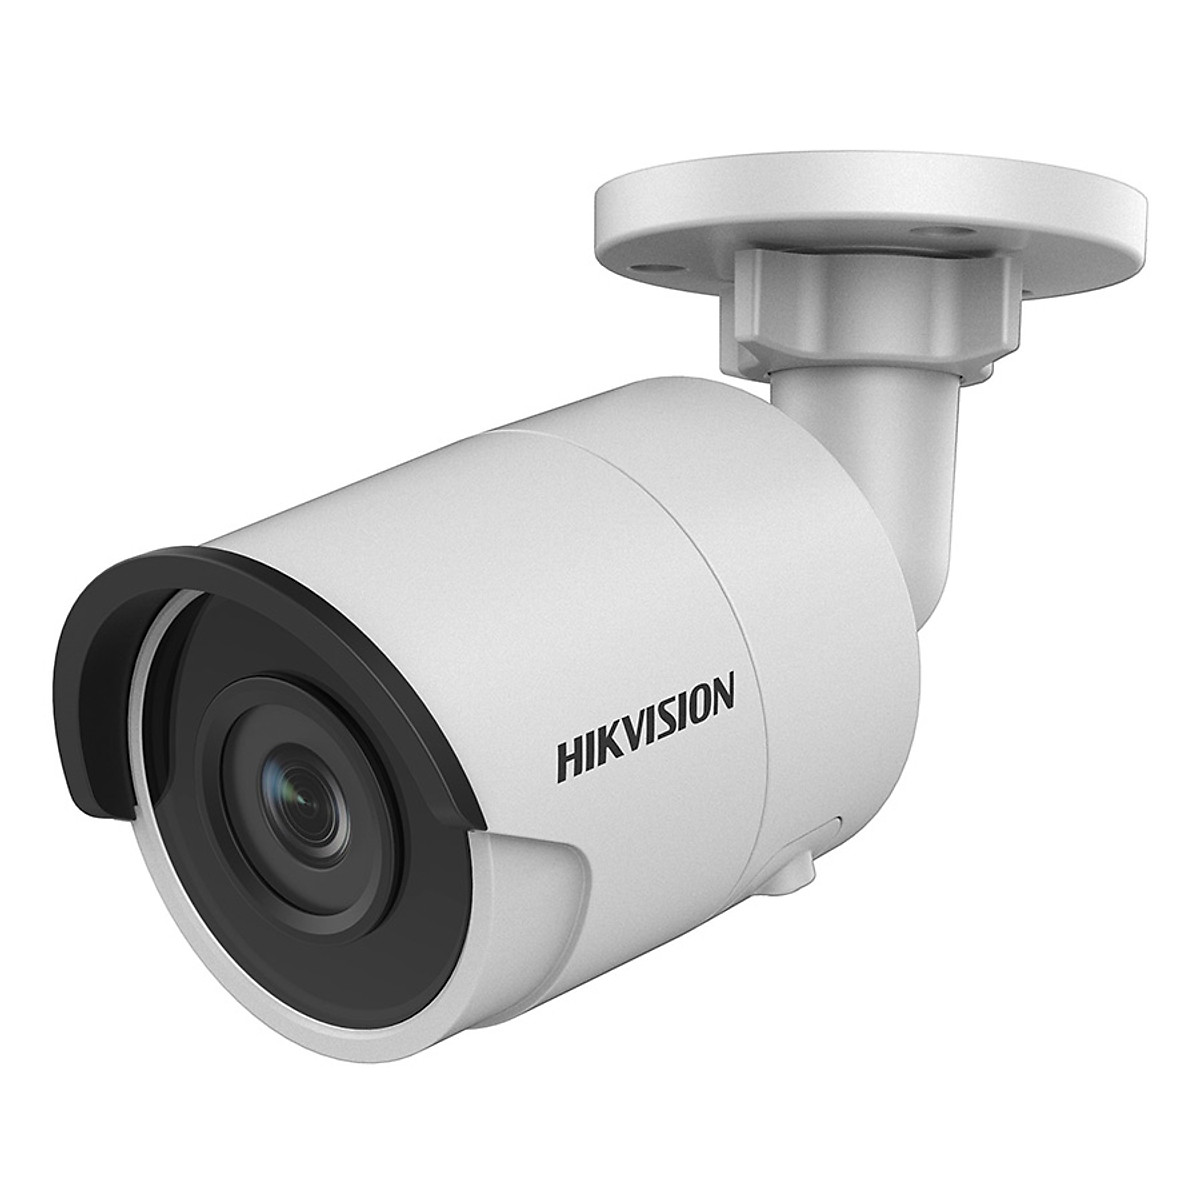 Camera IP HIKVISION DS-2CD2083G0-I 8.0 Megapixel – Hàng Nhập Khẩu